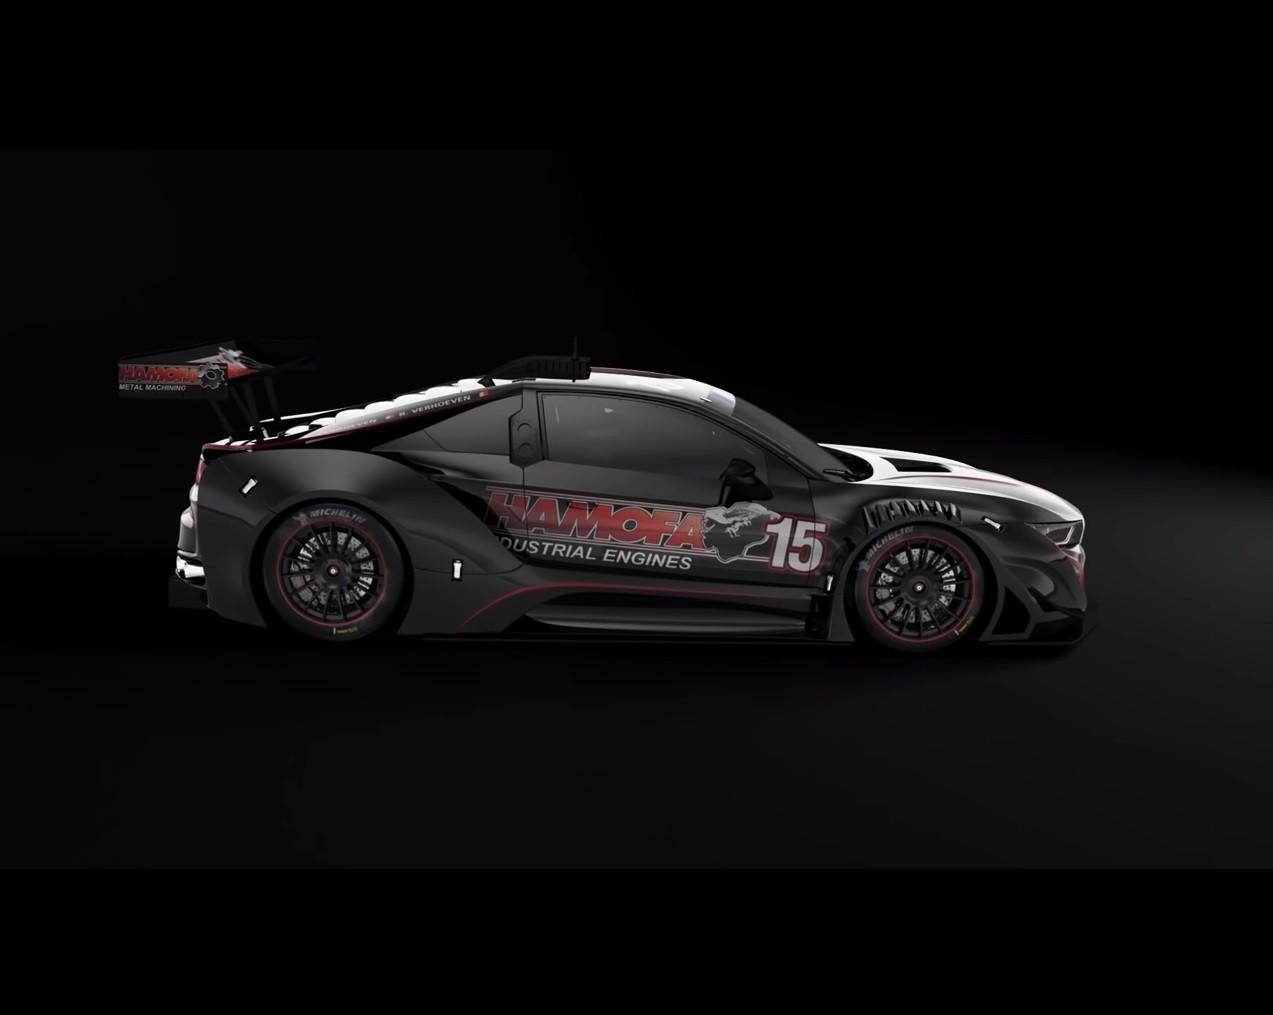 Bmw I8 Gtr Silhouette Racing Car Abandons Plug In